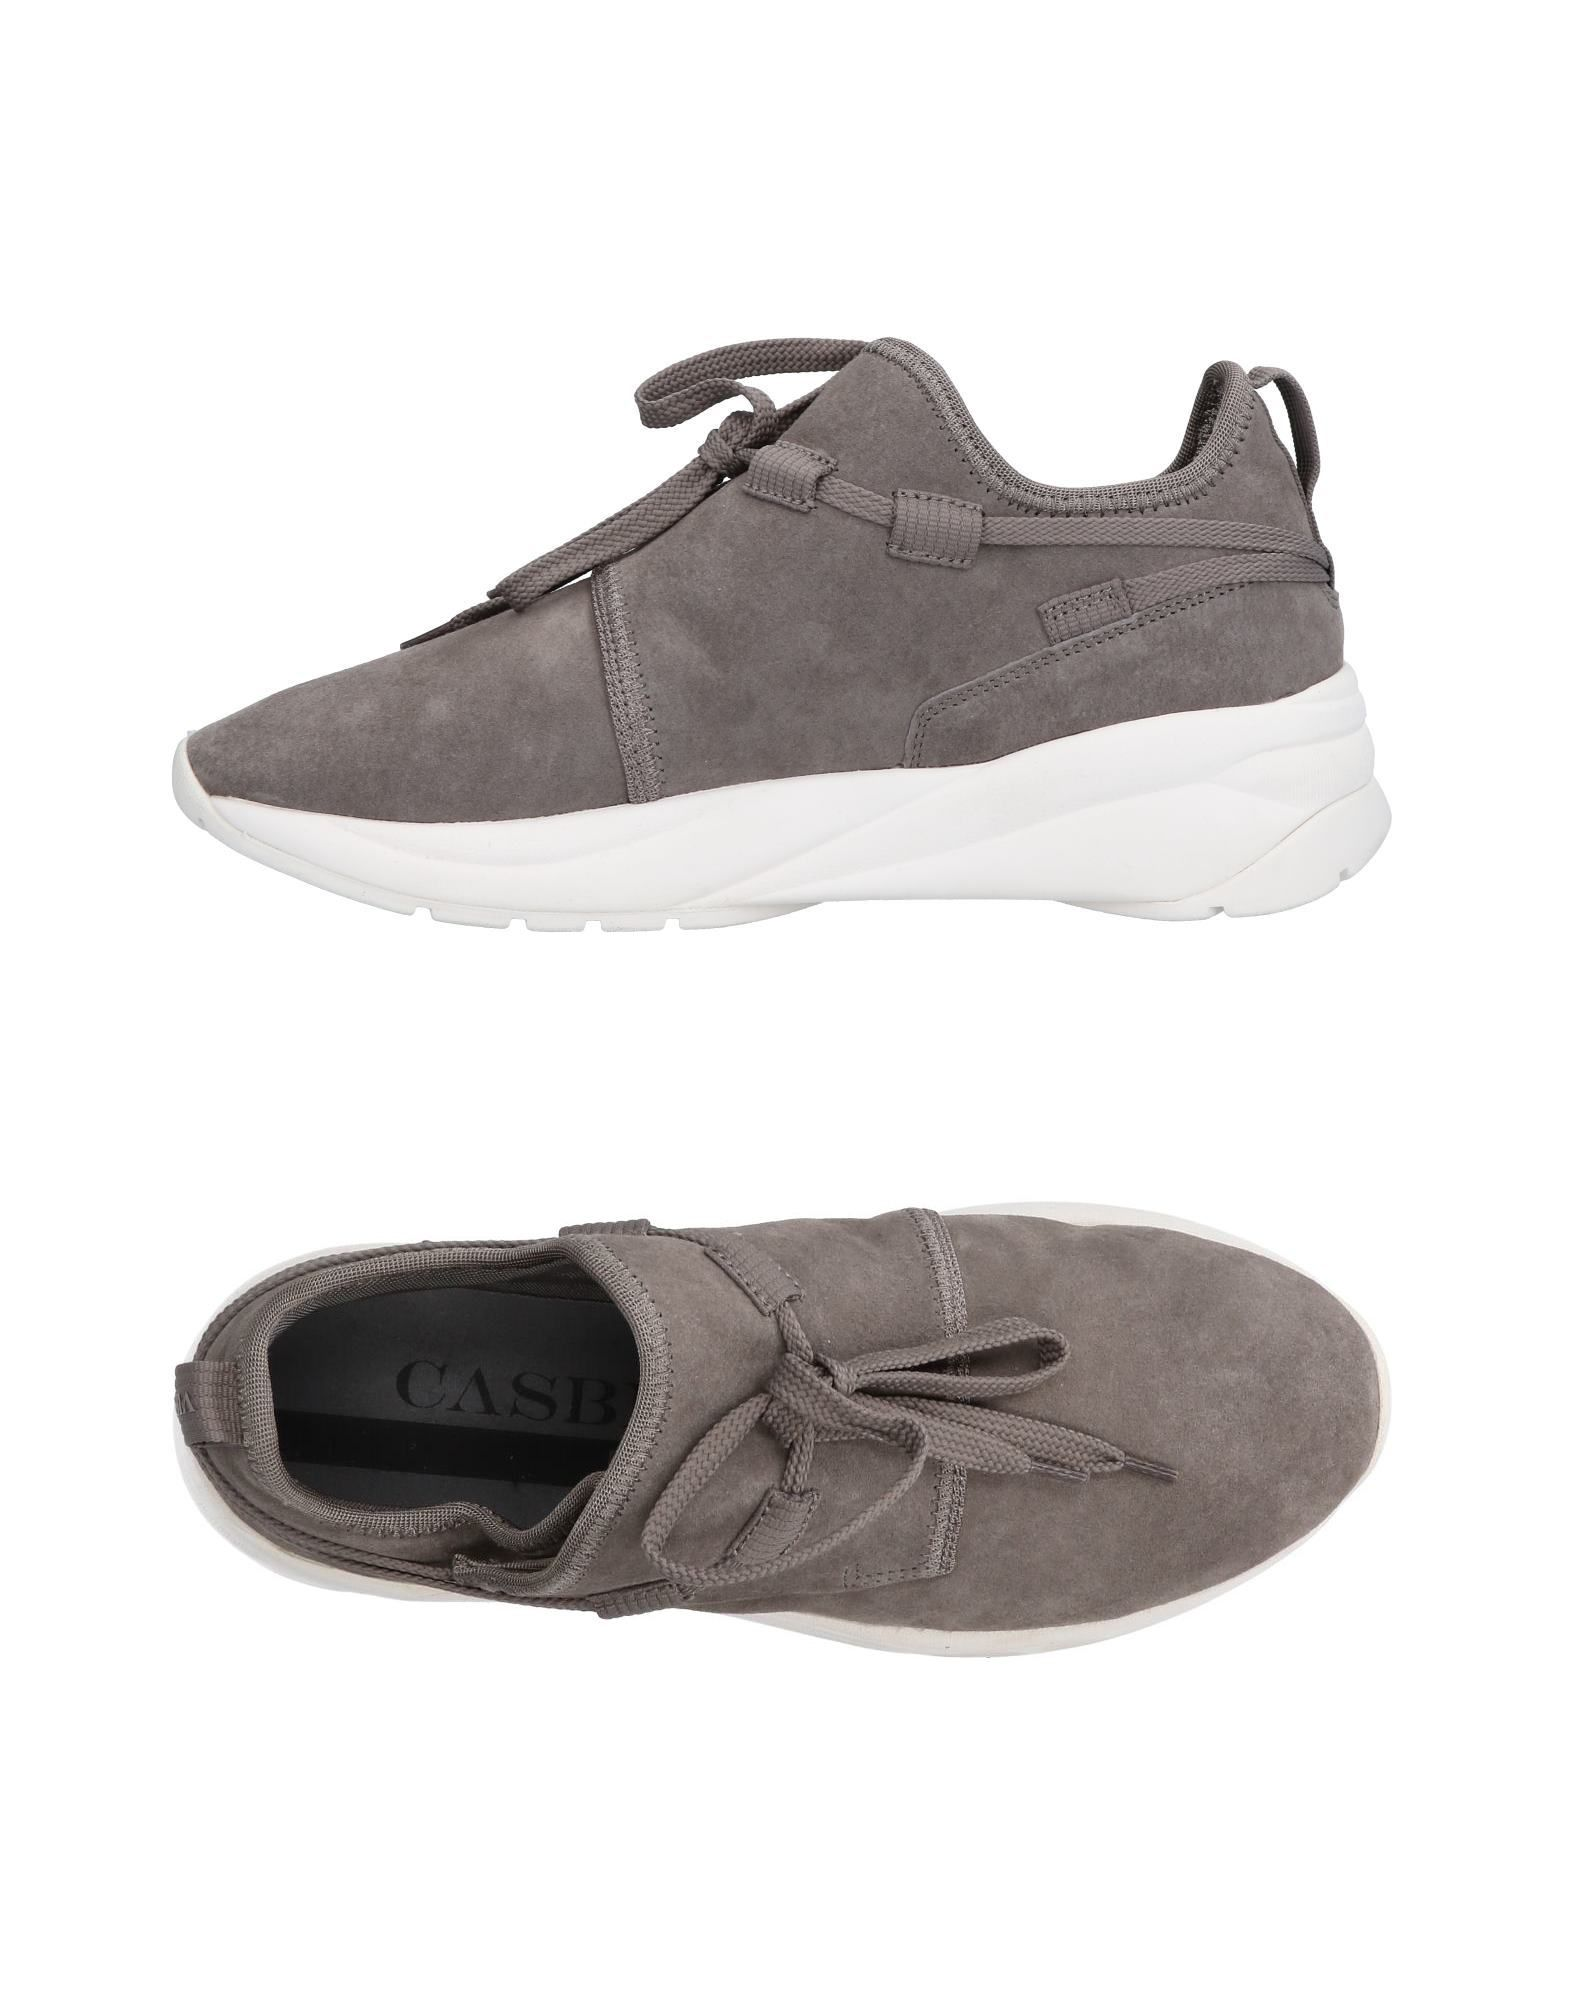 Moda 11486160ST Sneakers Casbia Uomo - 11486160ST Moda 981a2d